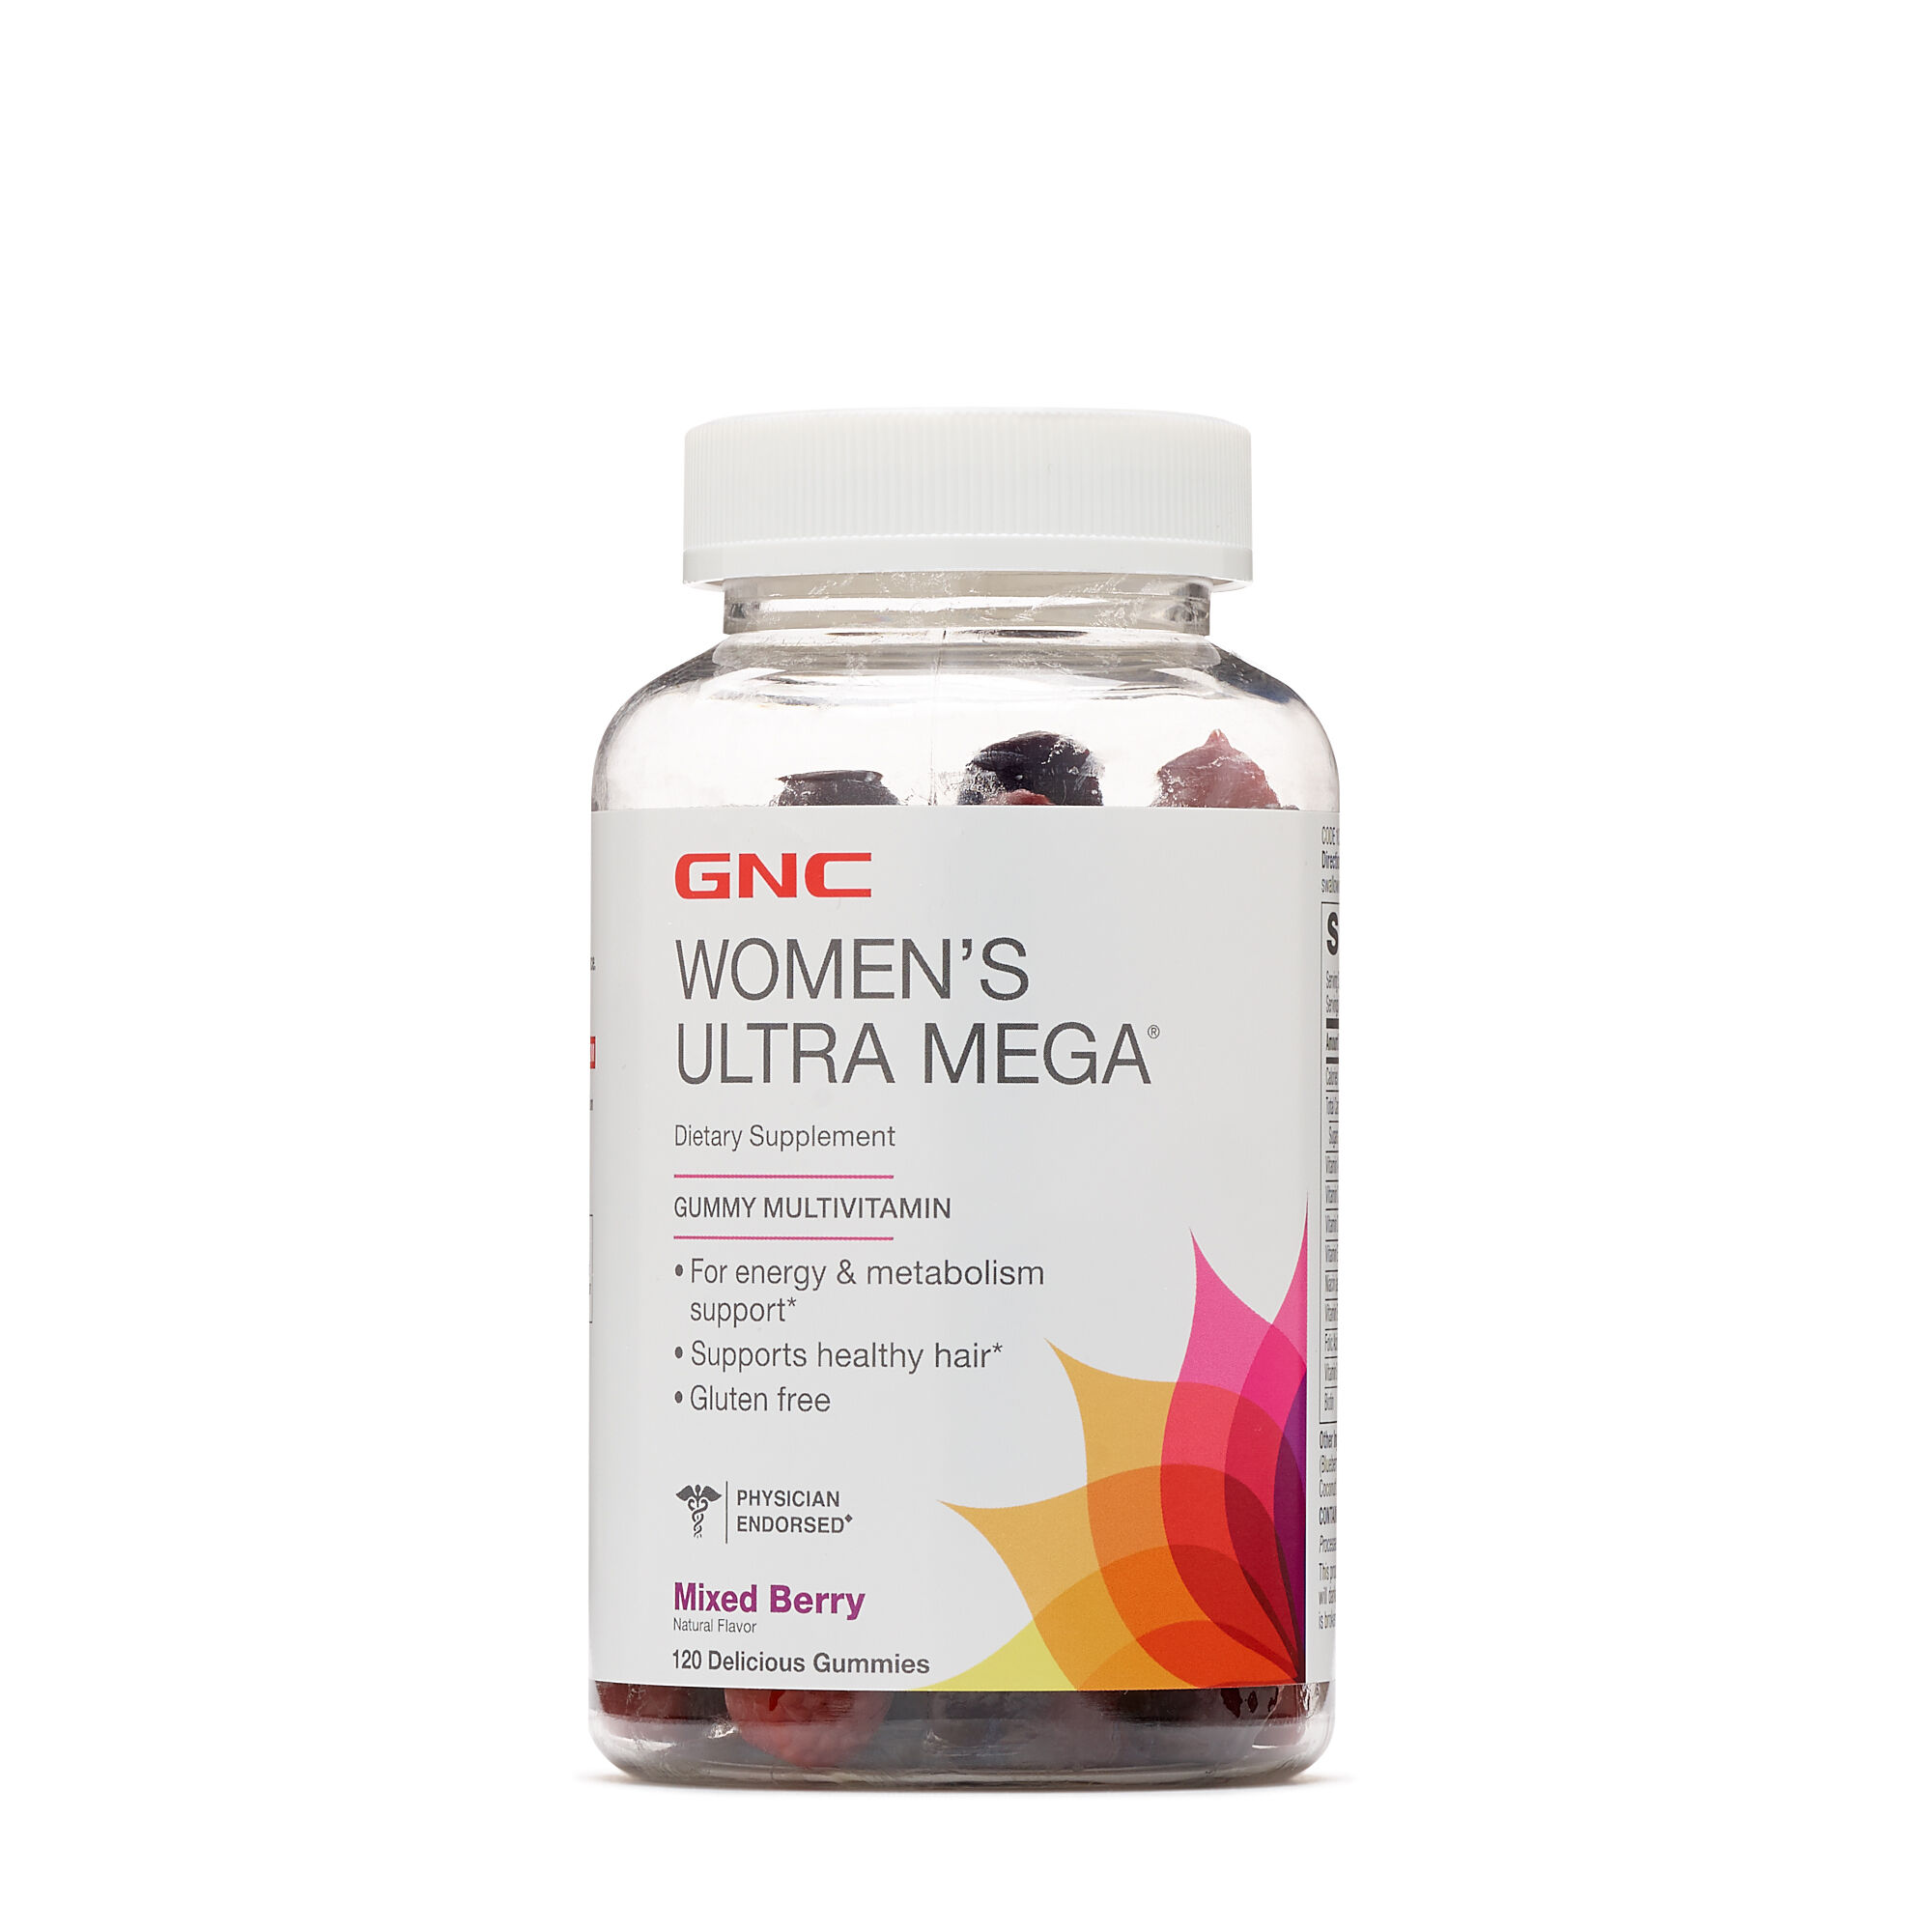 Best Womens Multivitamin >> Gnc Women S Ultra Mega Gummy Multivitamin Mixed Berry